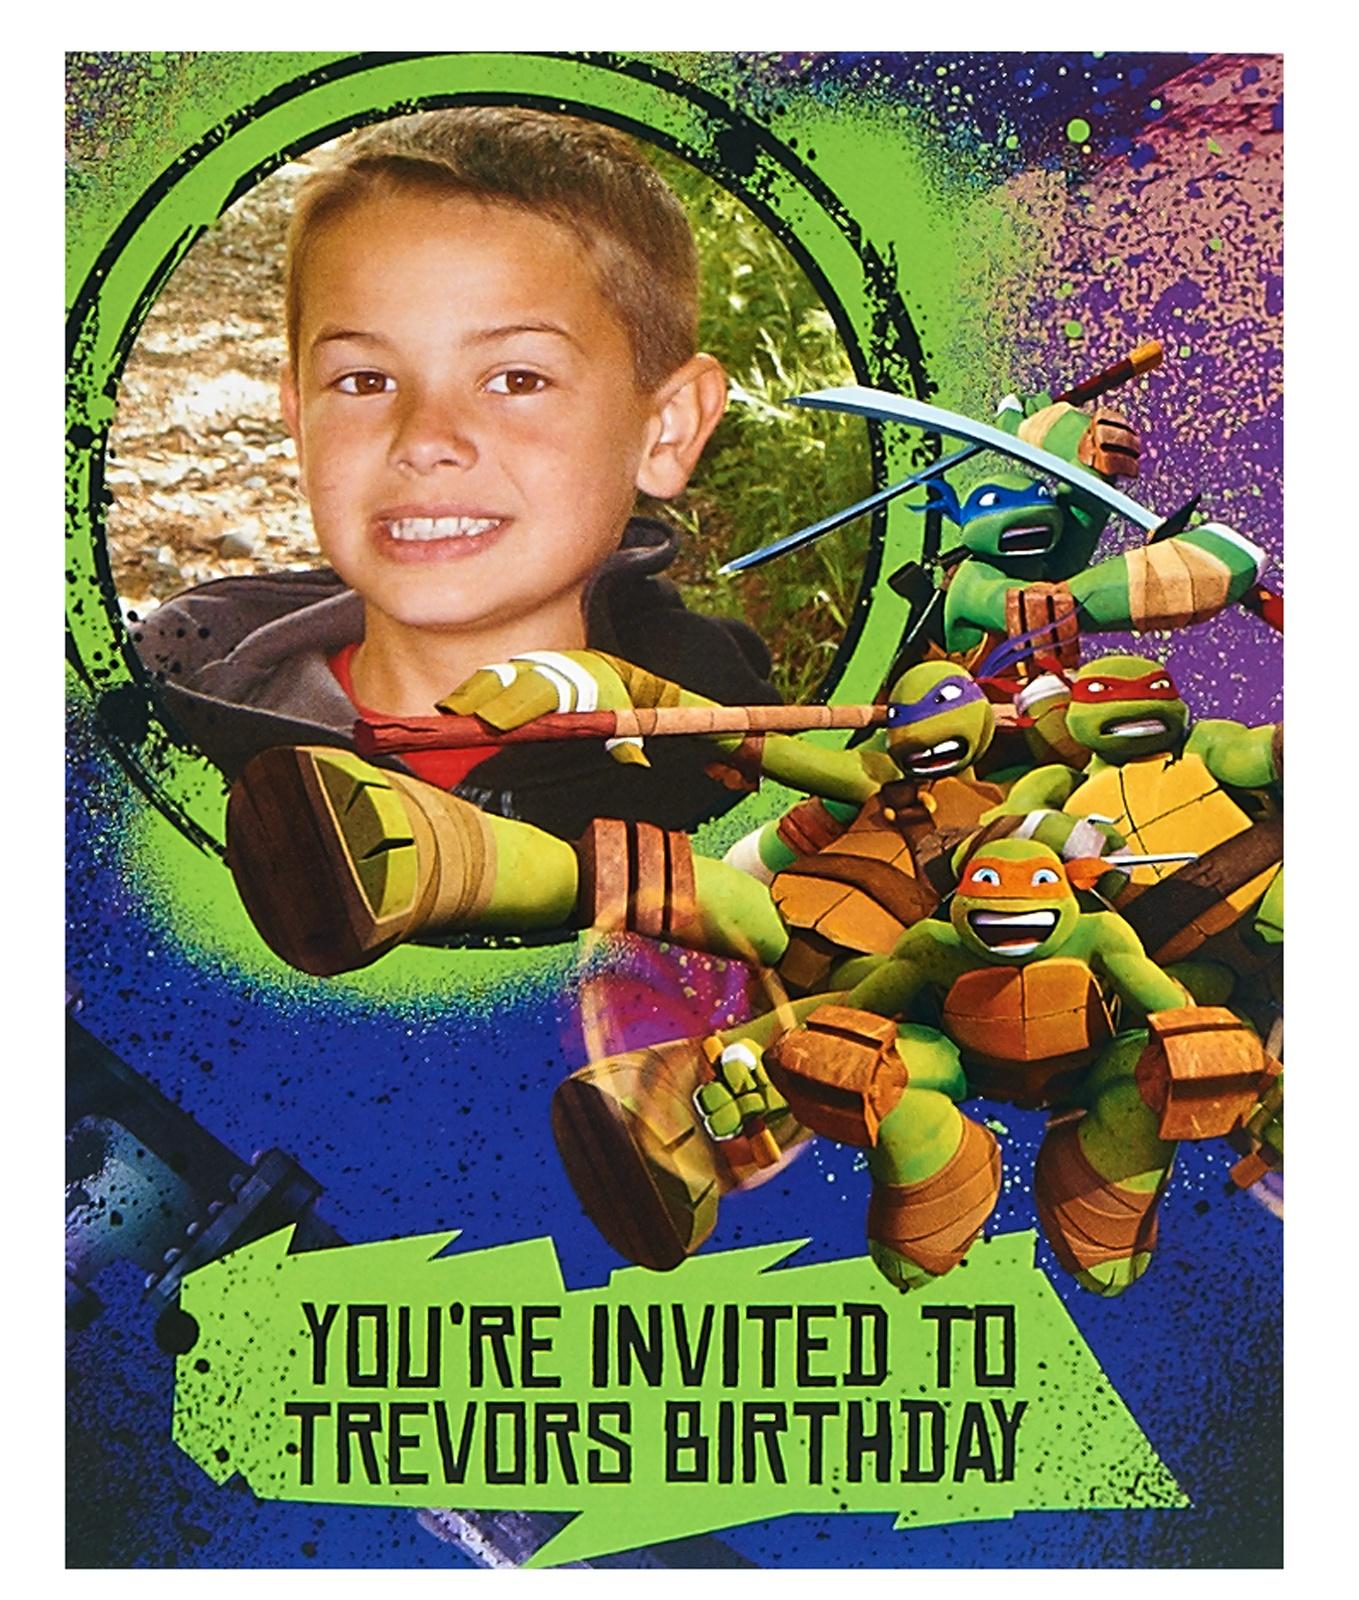 Teenage Mutant Ninja Turtles Party Supplies: Personalized Invites